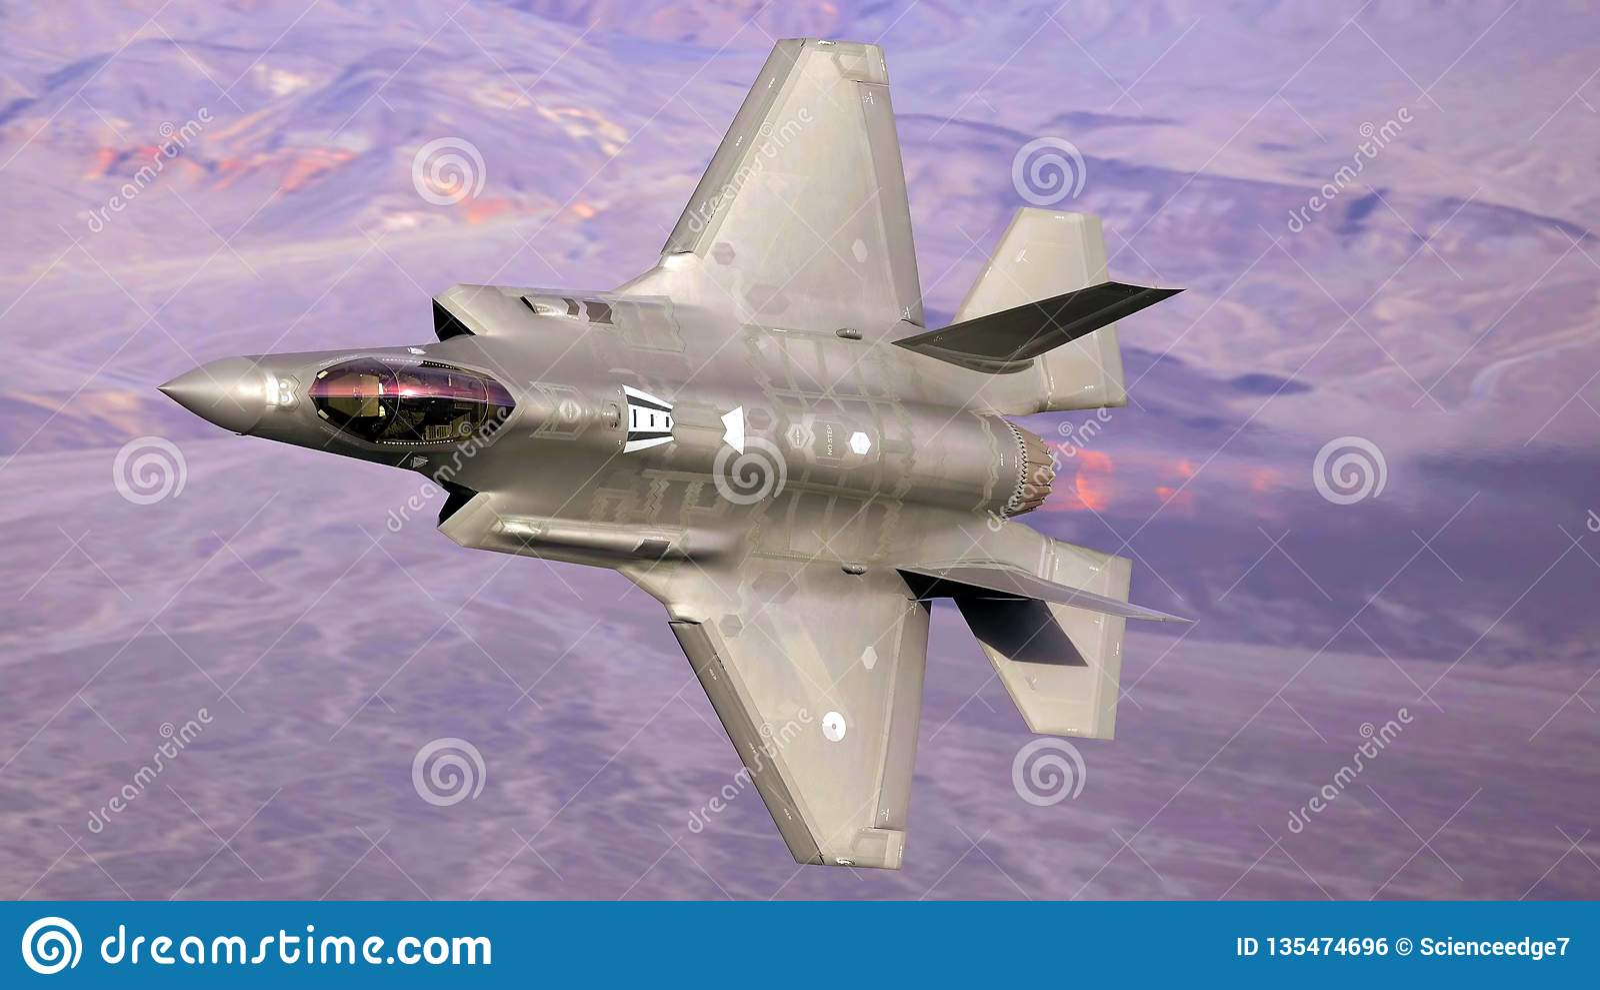 U S Voo do jato do Joint Strike Fighter da força aérea F-35 (relâmpago II)